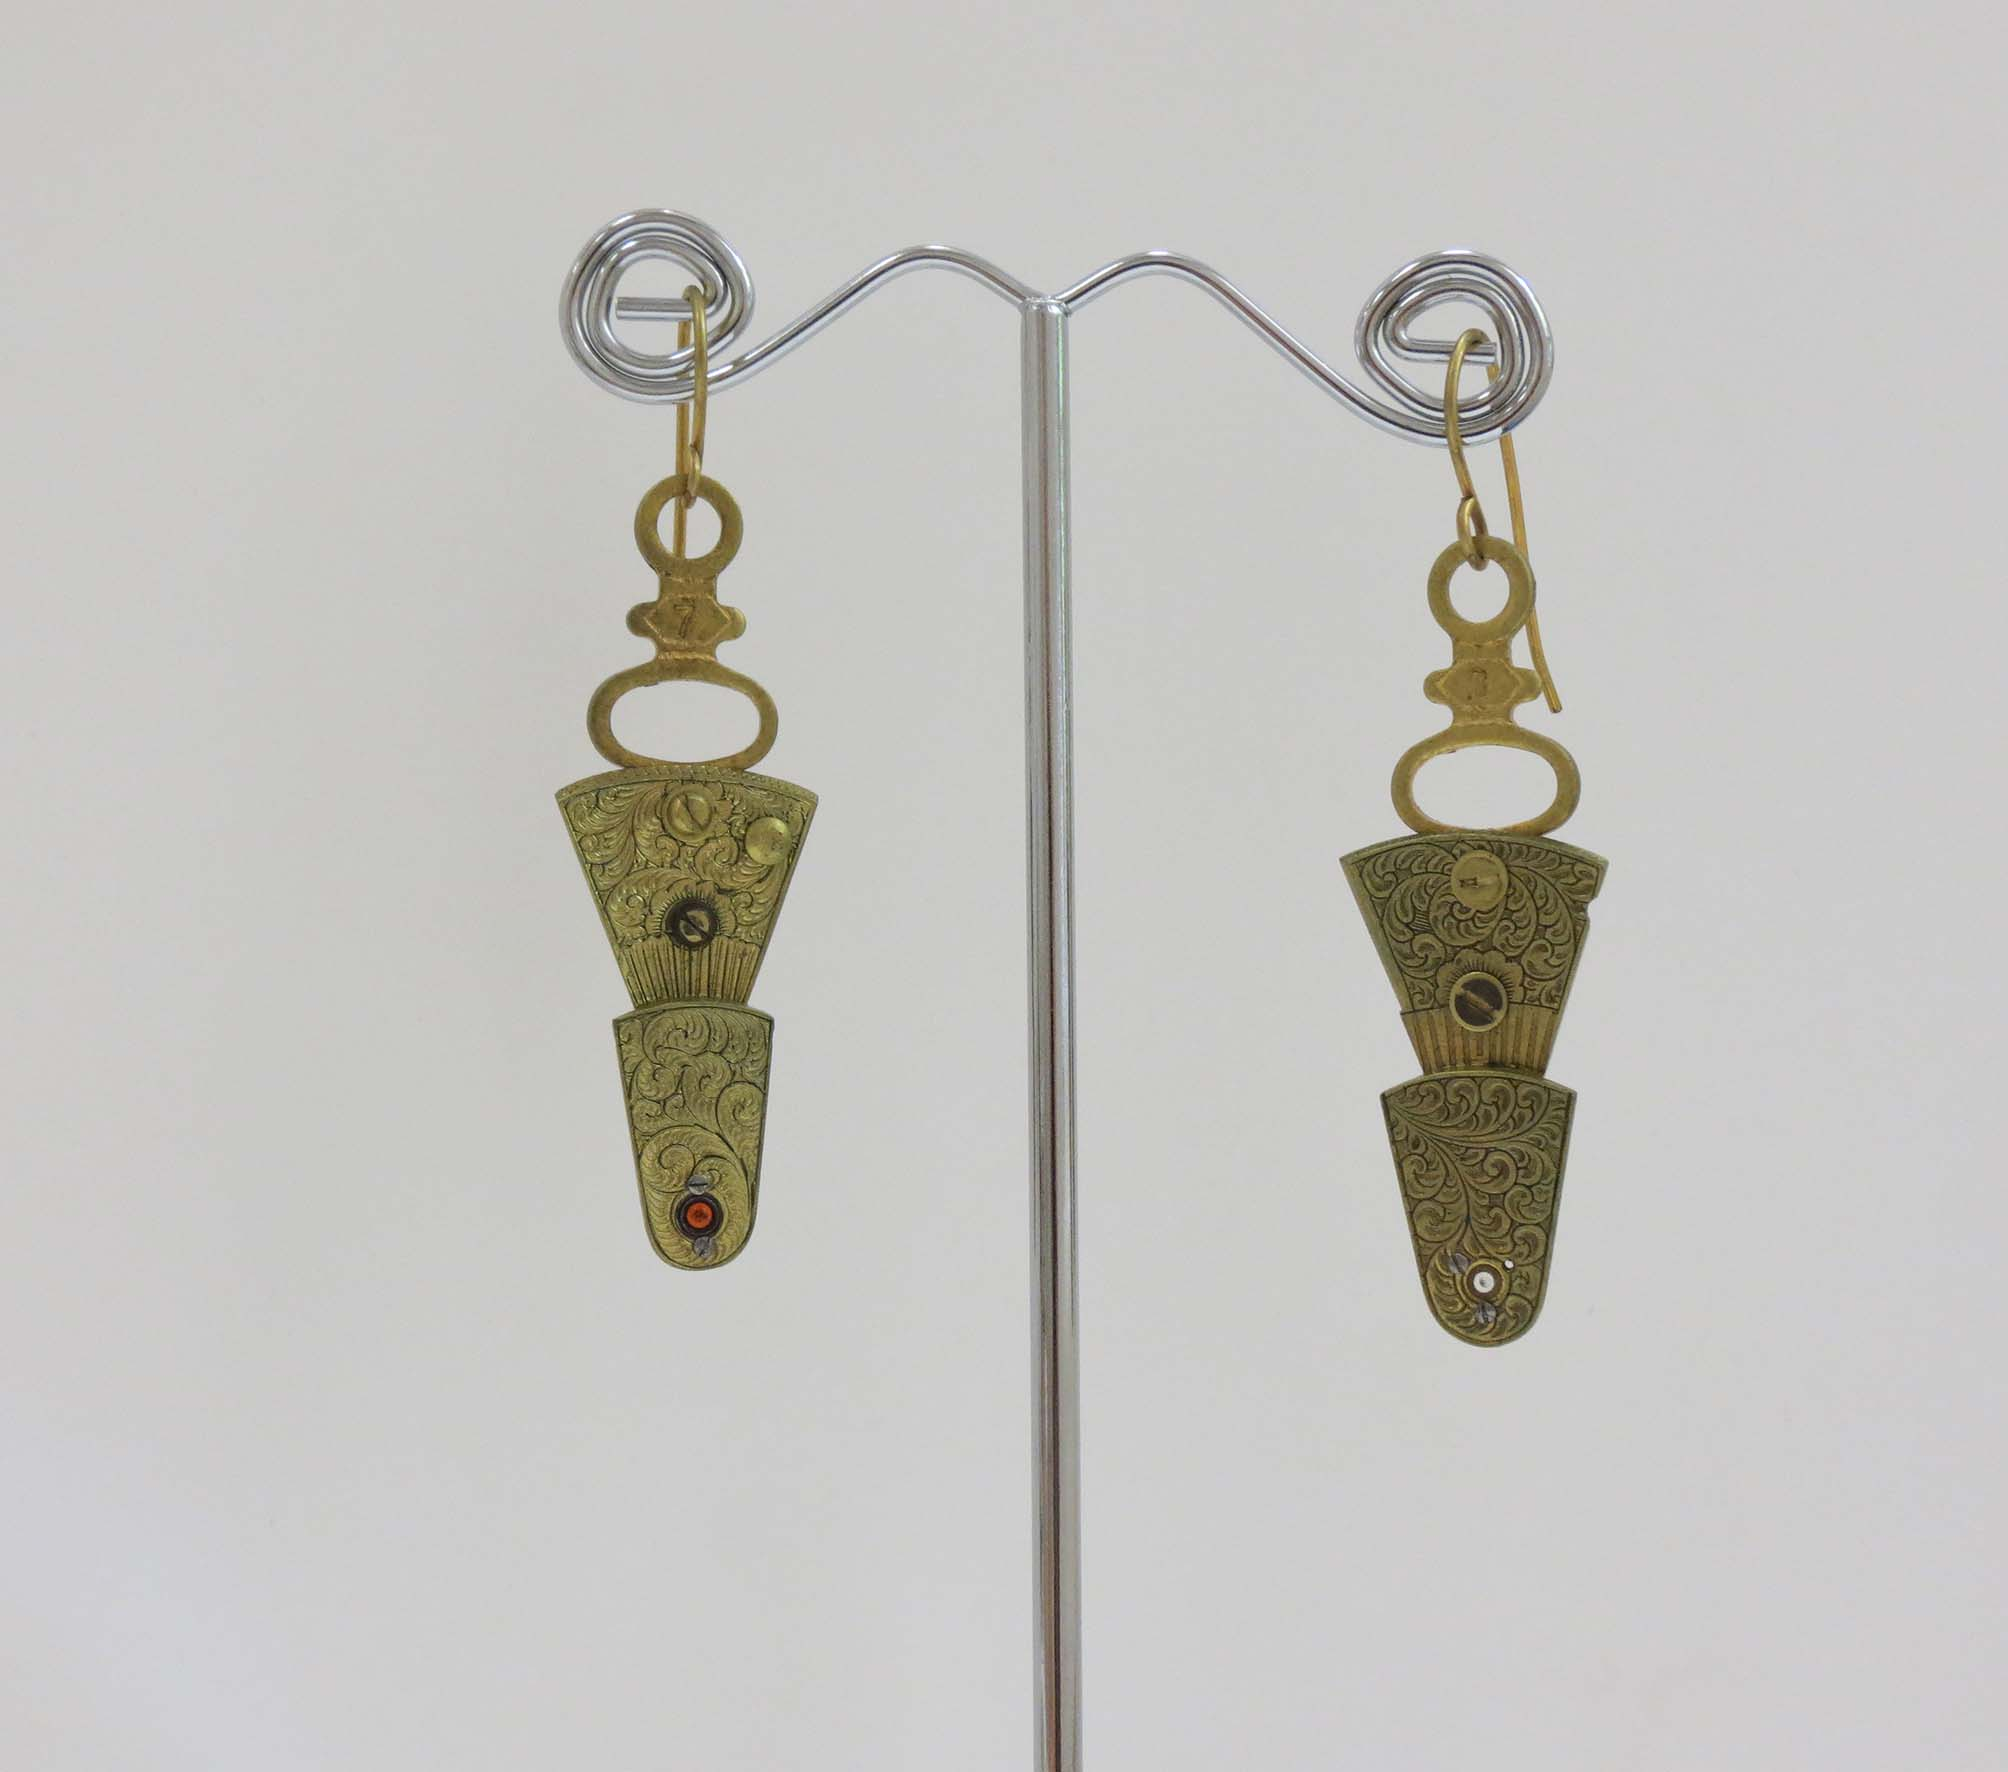 23. Kathy Aspinall, 'Balance II', 2018, balance cocks, jewels, earrings, $125